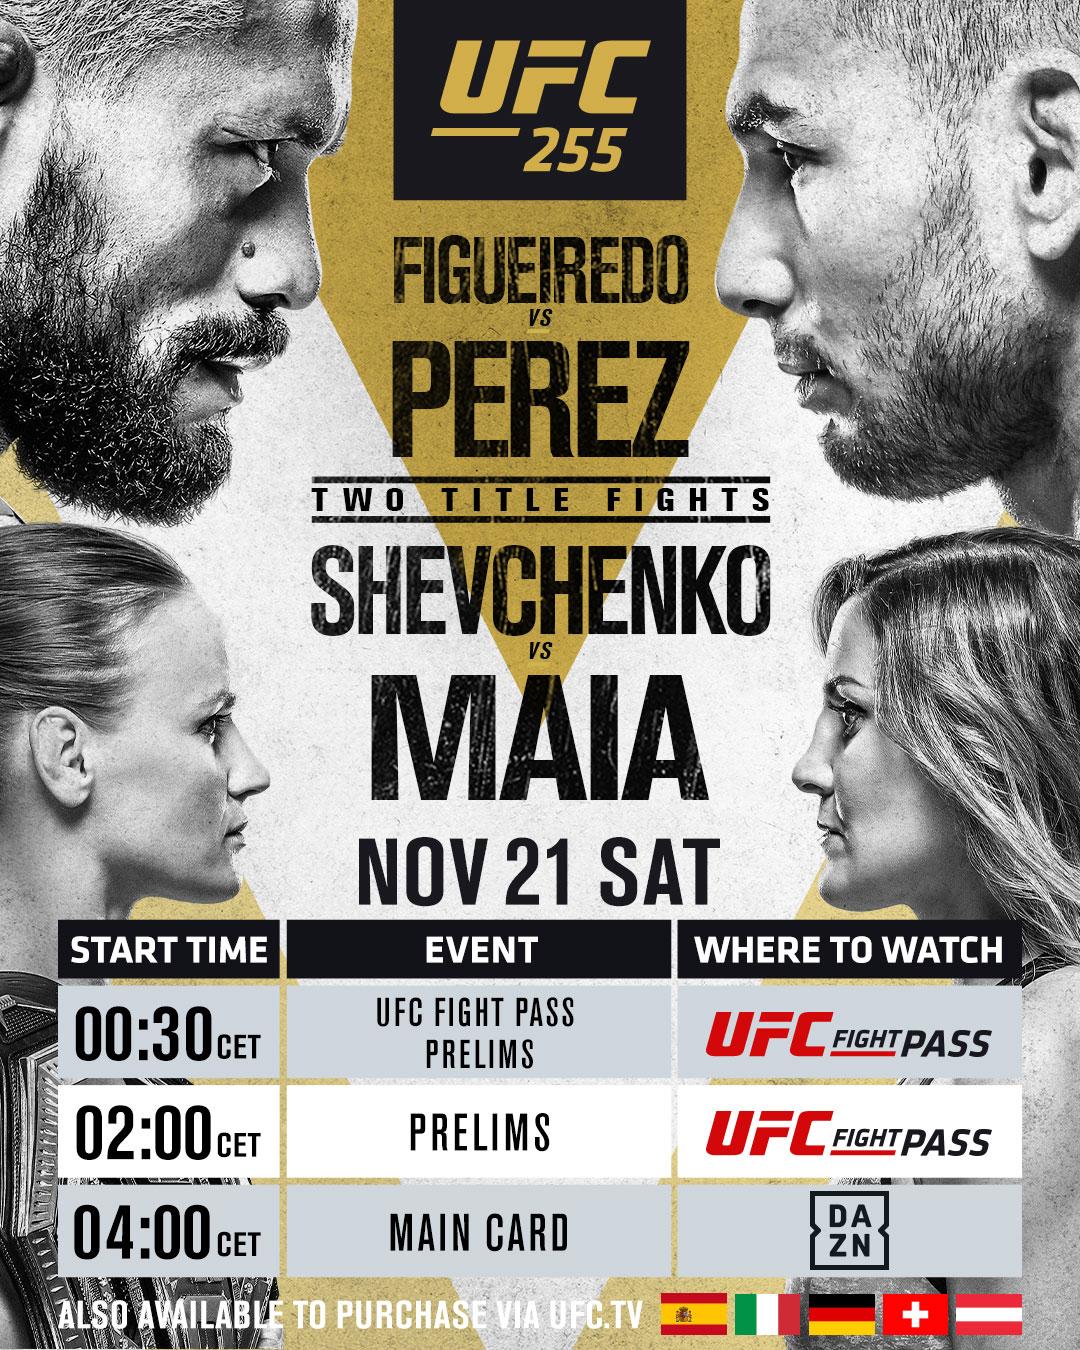 Figueiredo vs Perez Livestream